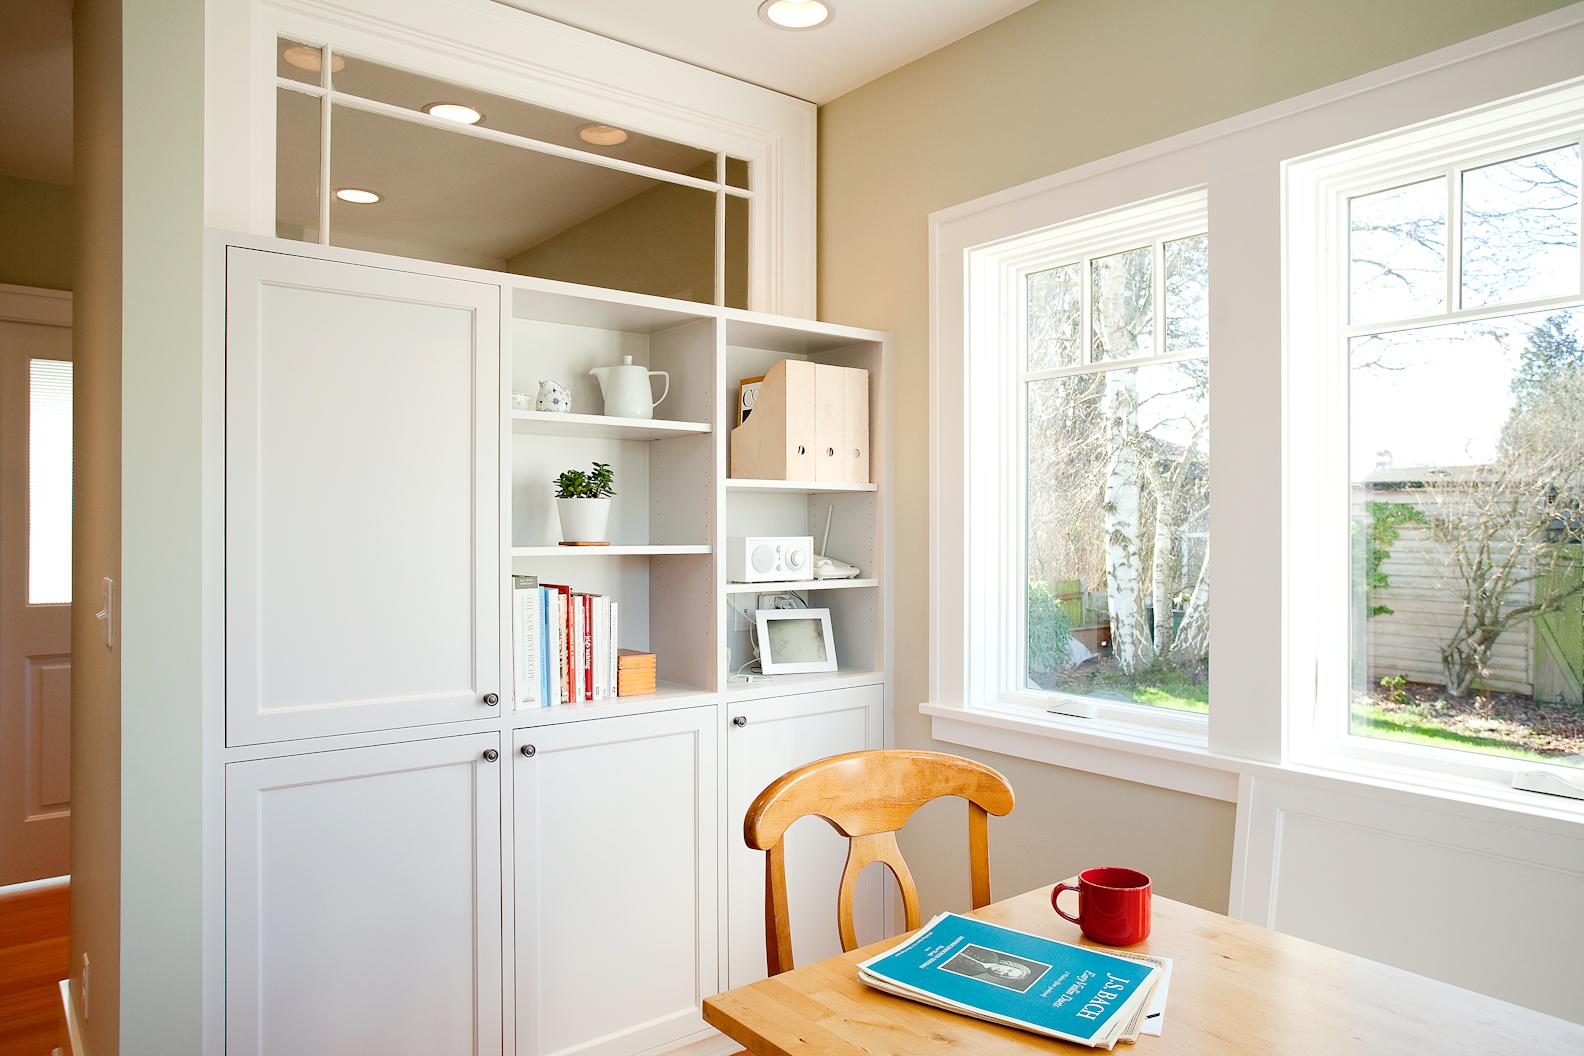 Family kitchen architecture